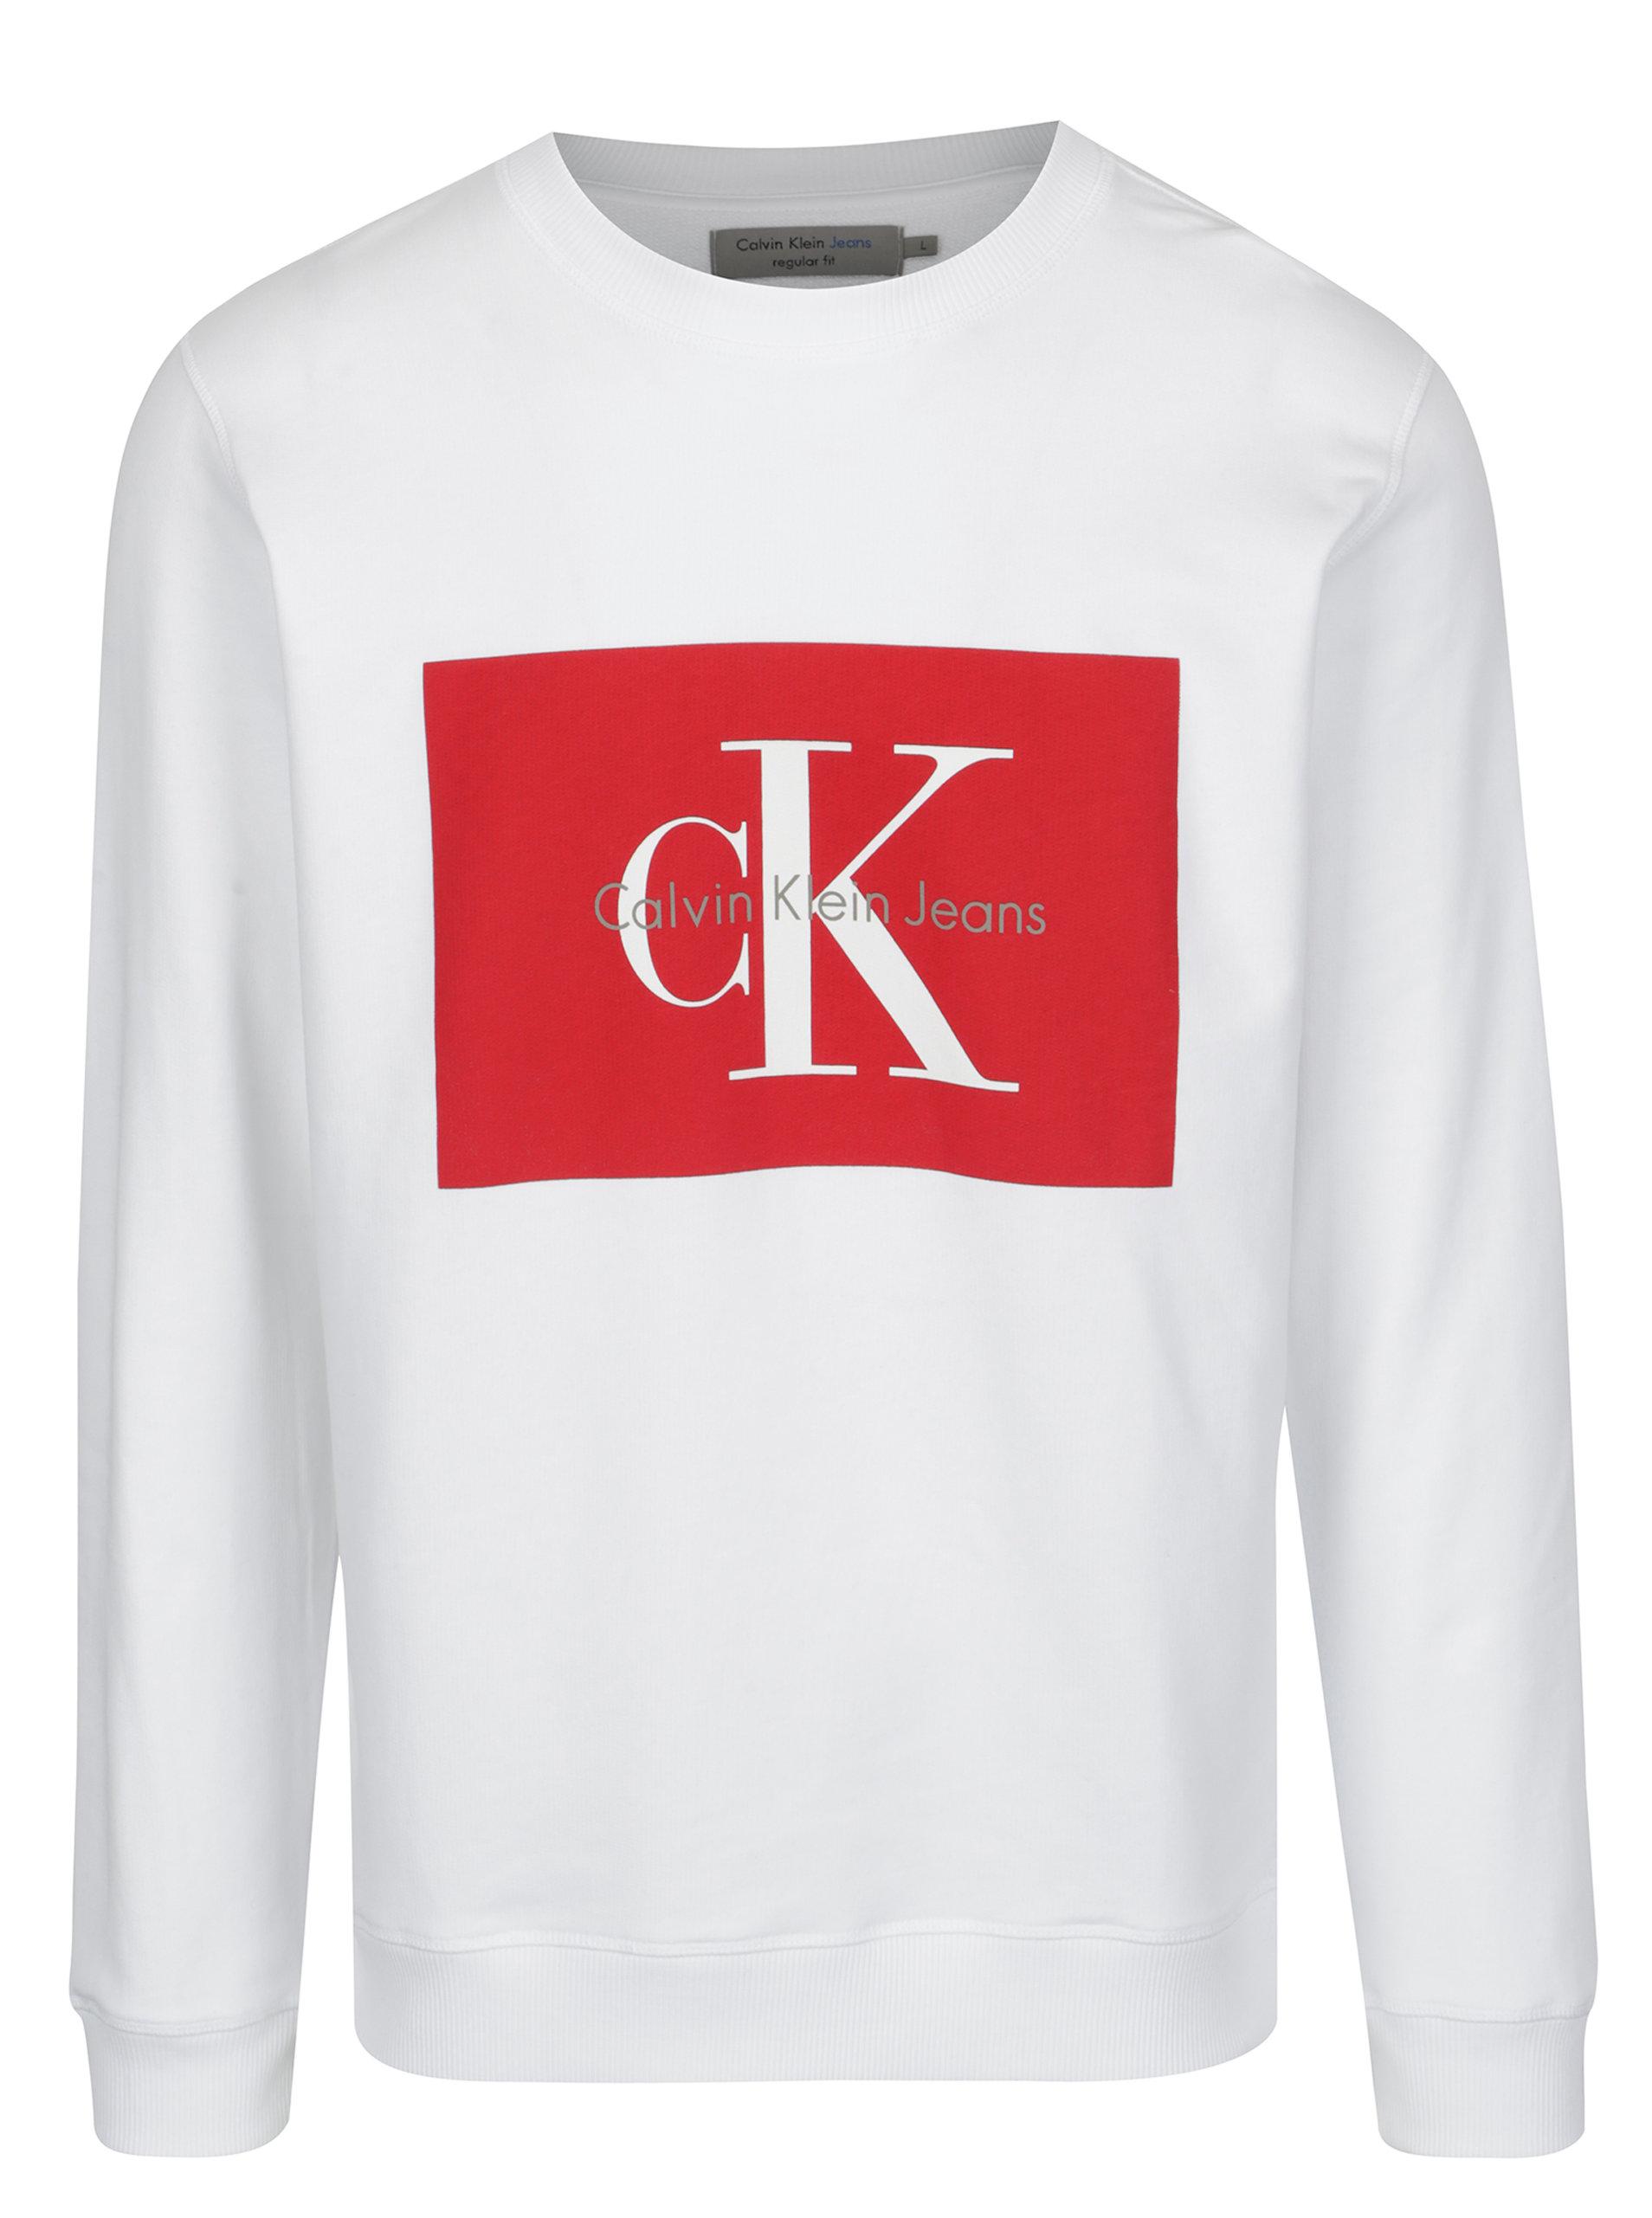 10b0c8eeb Bílá pánská mikina s potiskem v červené barvě Calvin Klein Jeans Hotoro